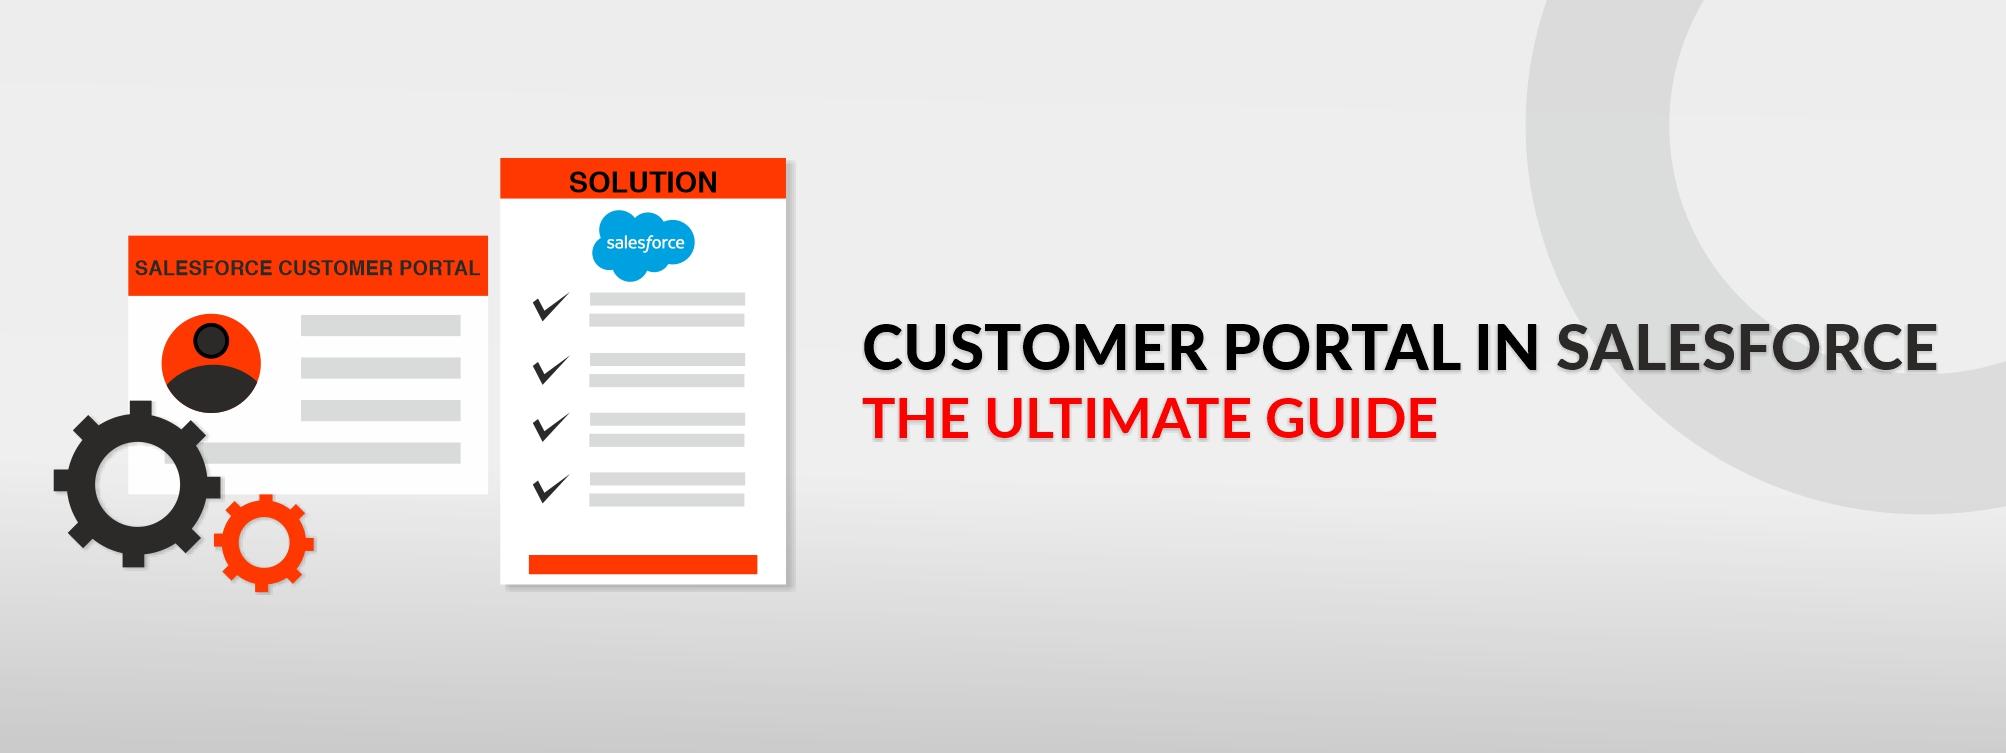 Customer Portal In Salesforce – The Ultimate Guide